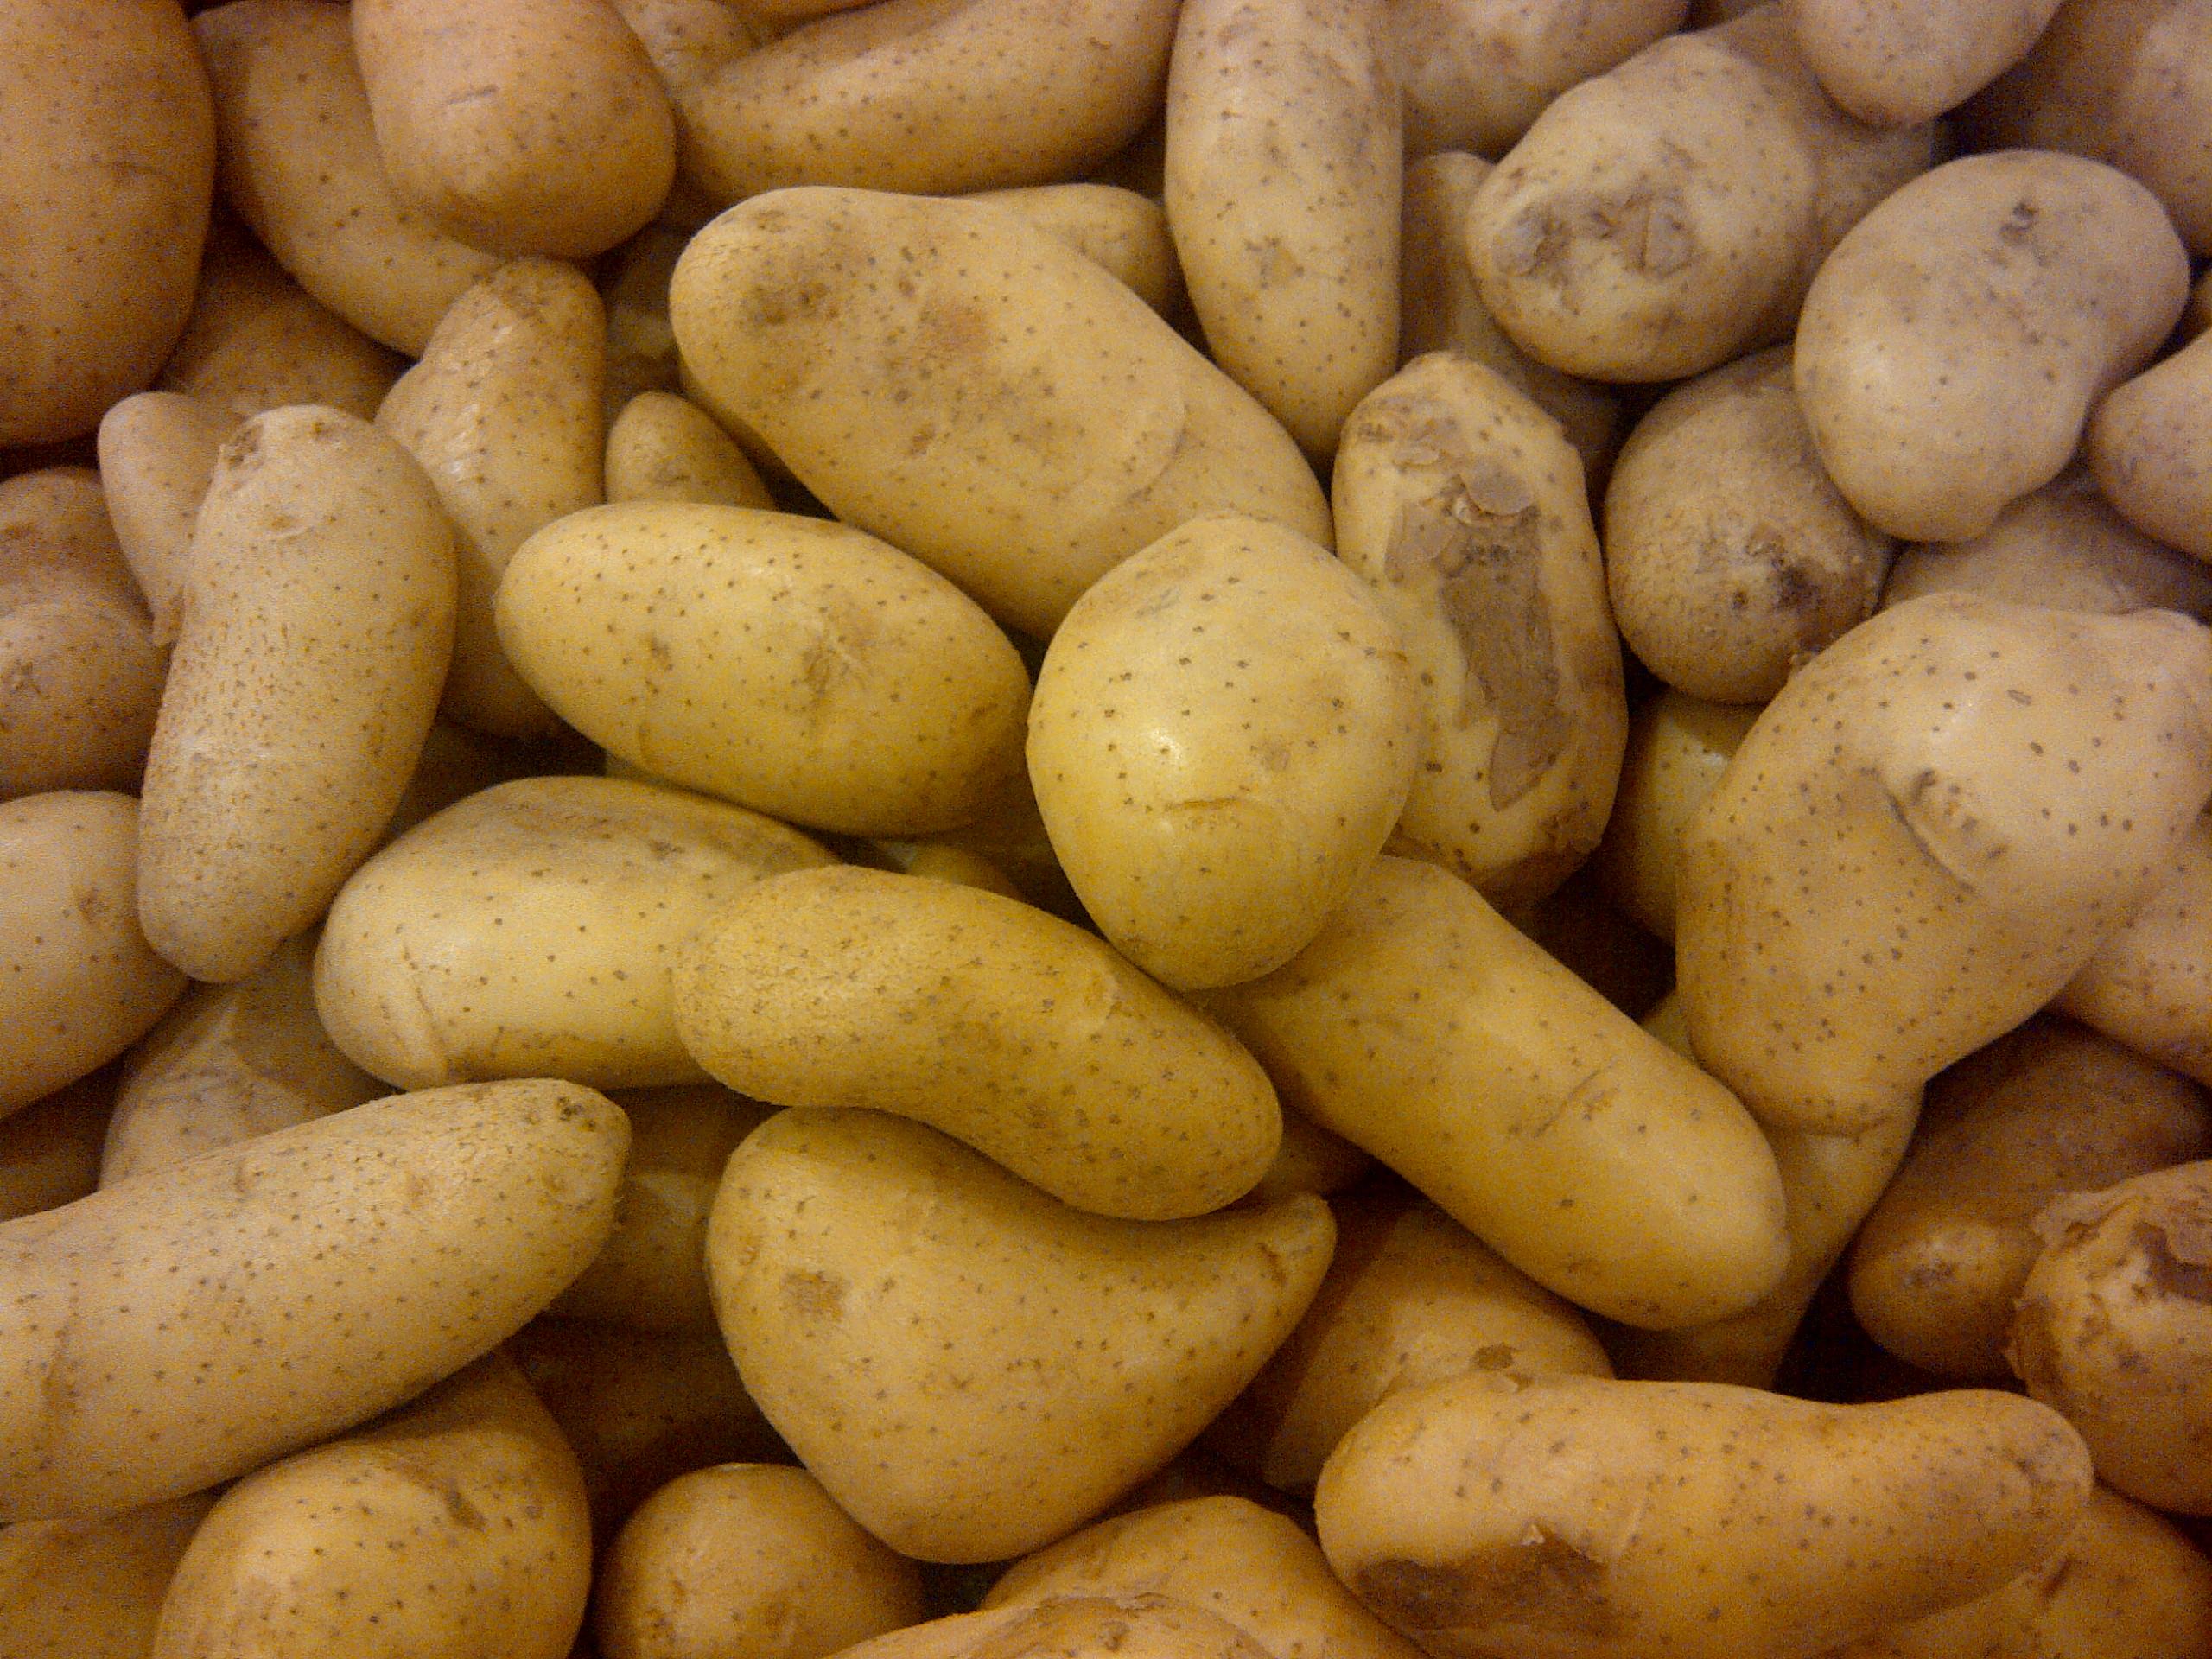 File:Potato 123.jpg